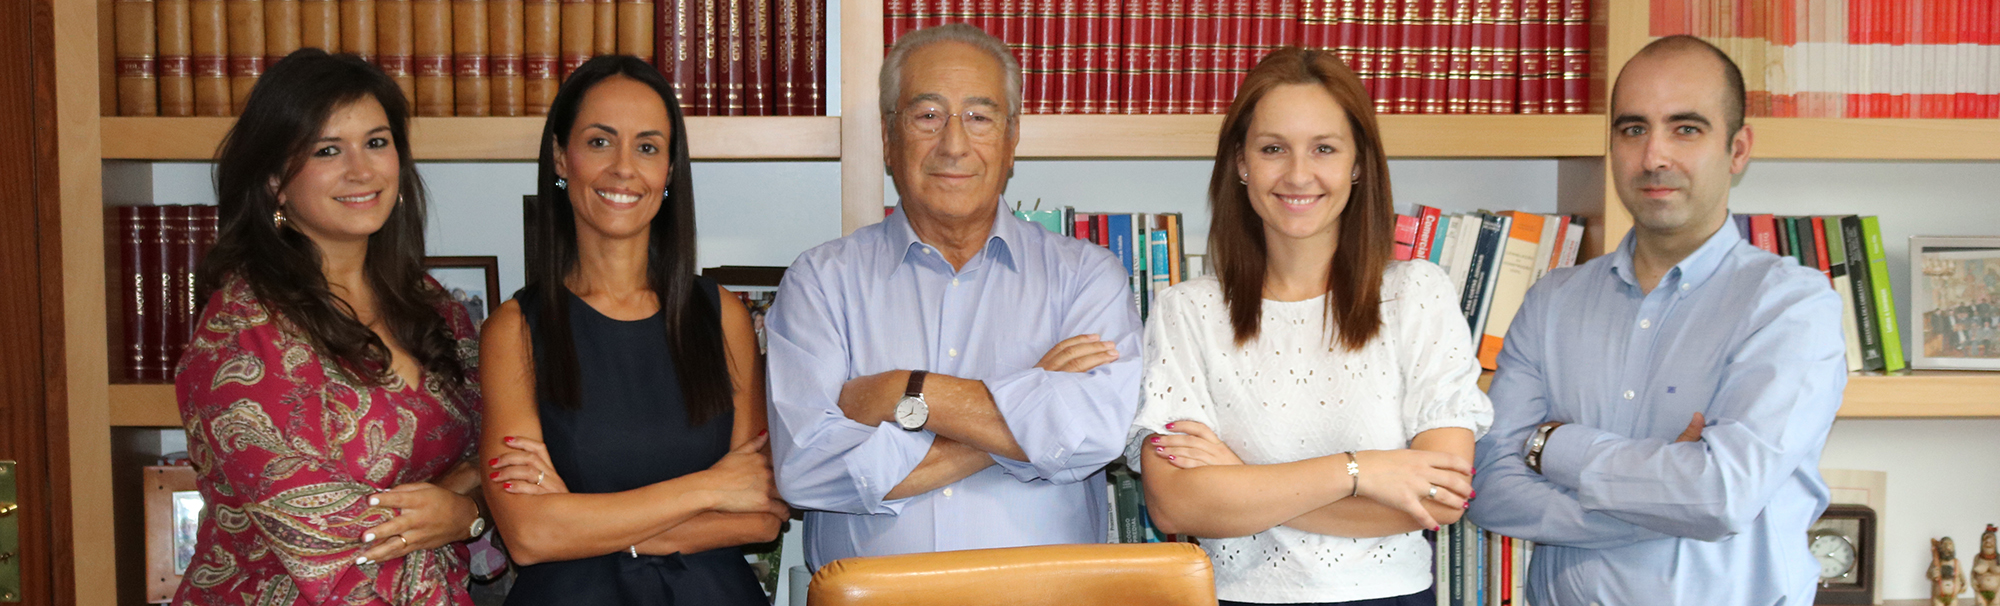 Equipa-LR-Advogados